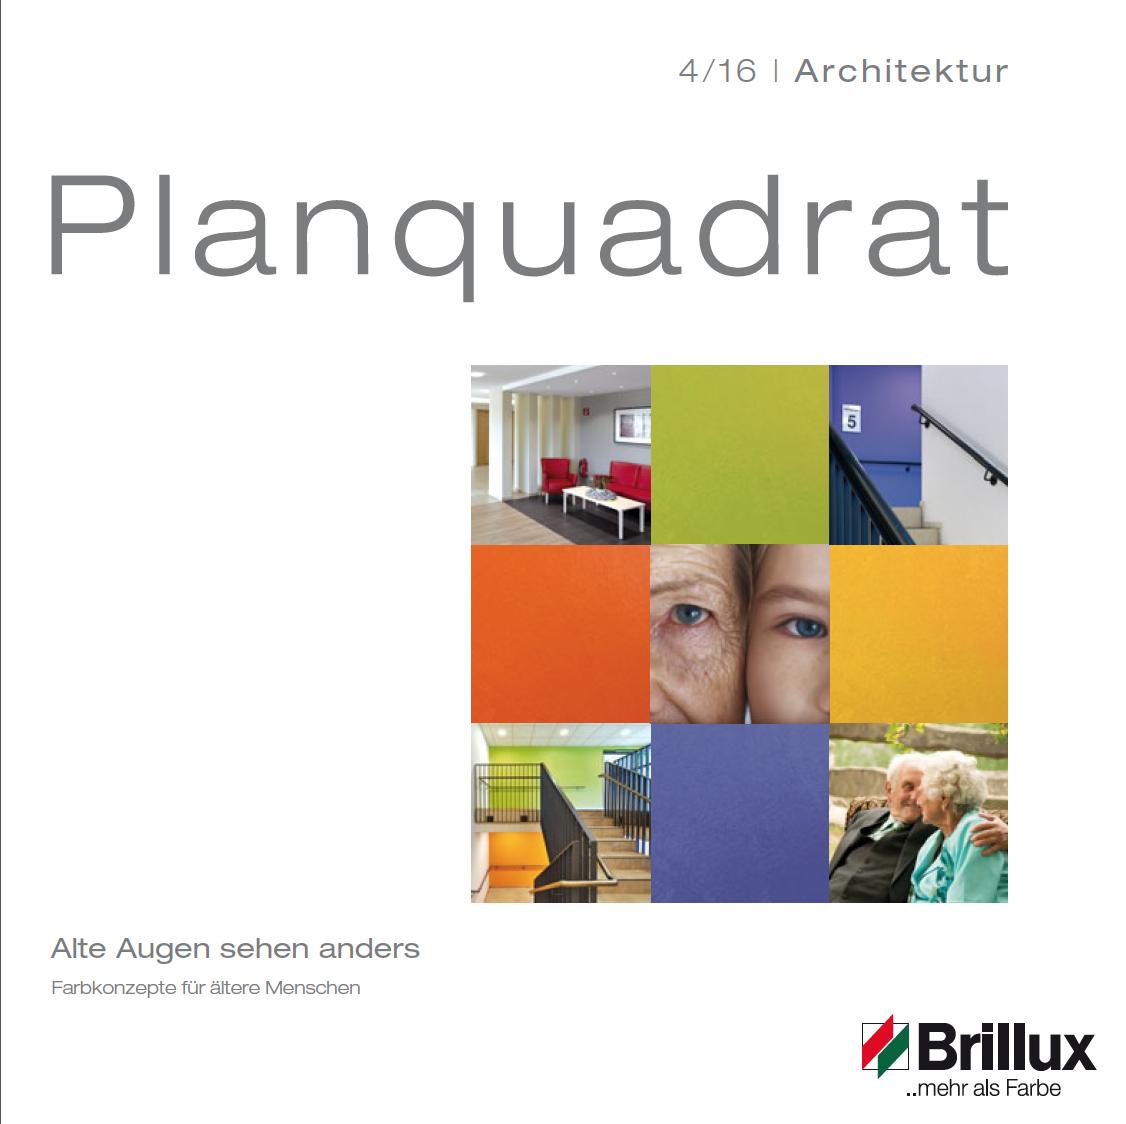 planquadrat_04_16